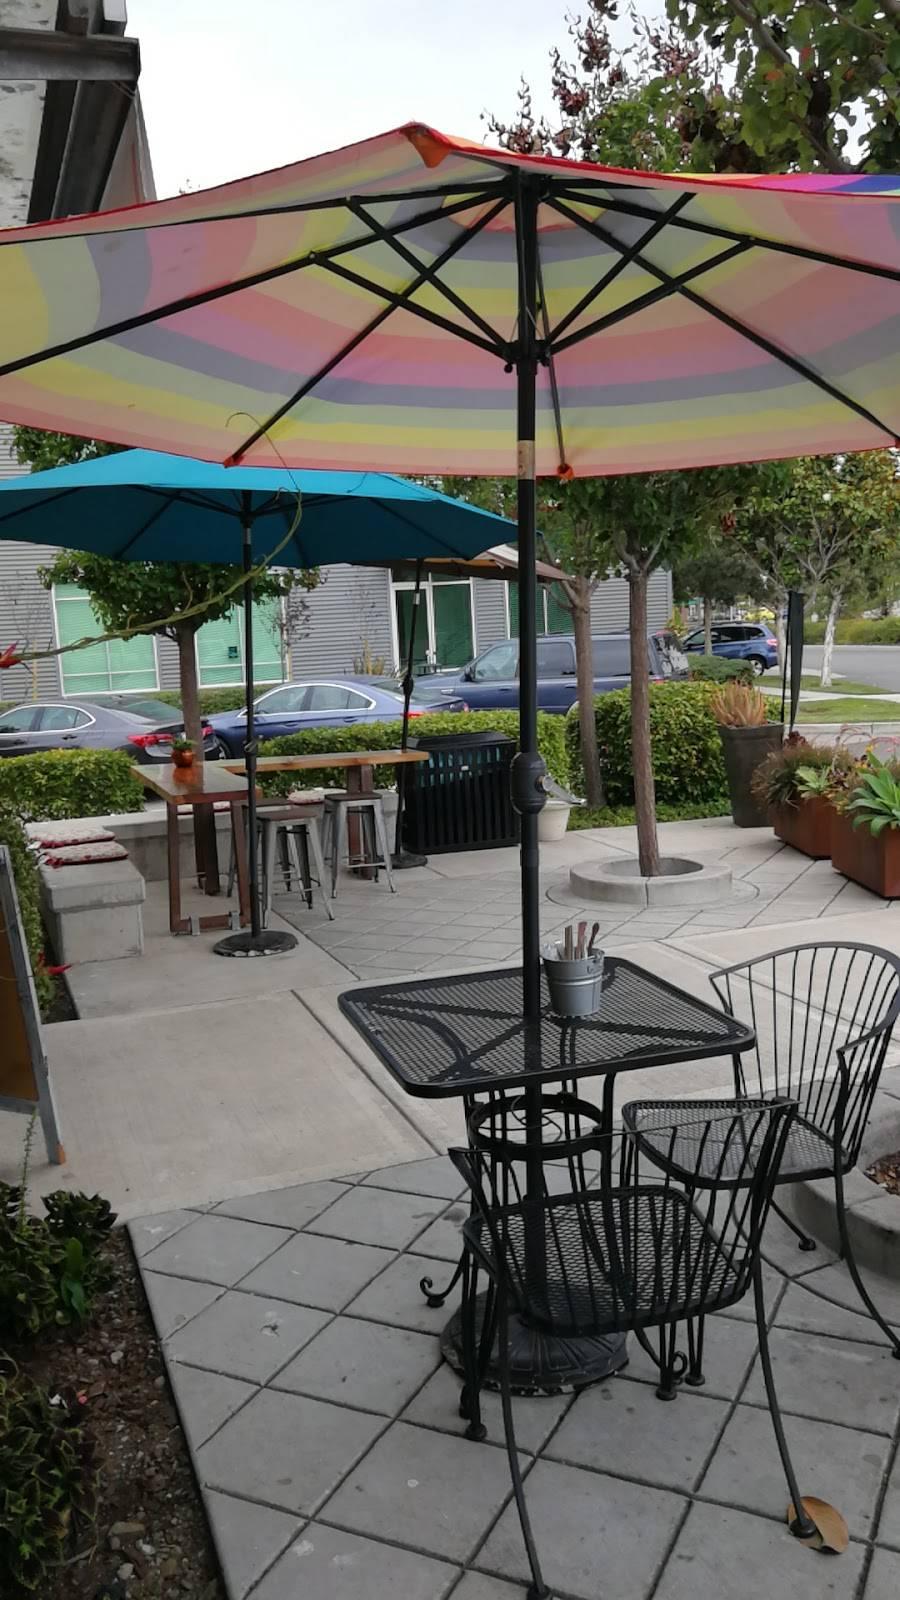 the artisan kitchen | restaurant | 845 Marina Bay Pkwy #865, Richmond, CA 94804, USA | 5104474010 OR +1 510-447-4010